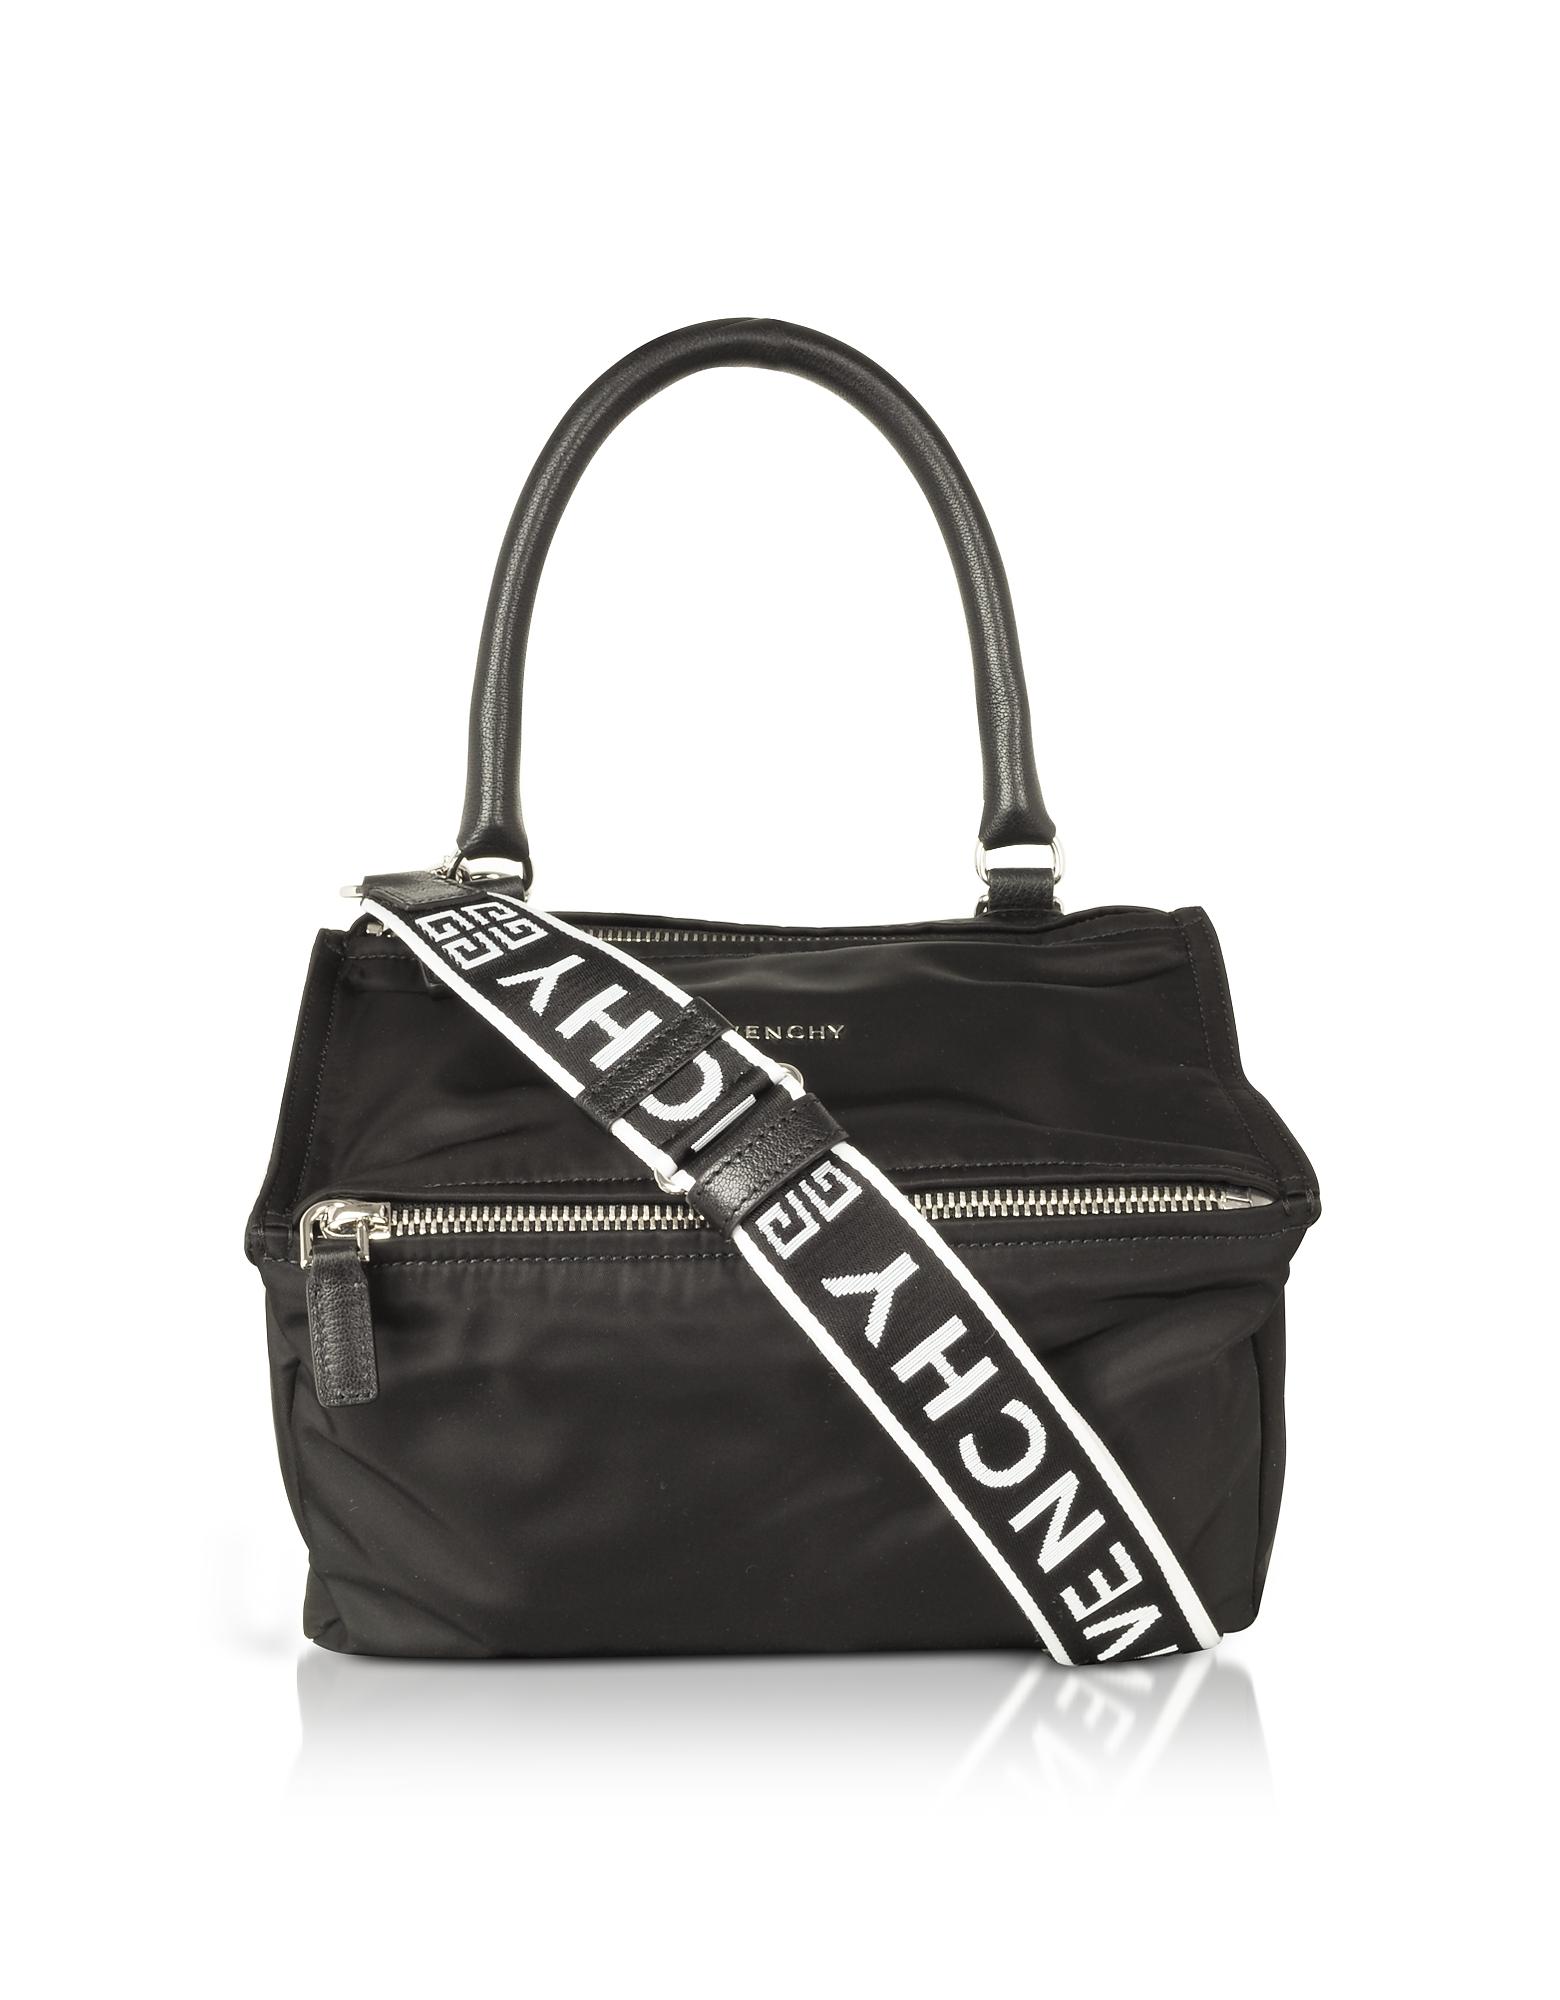 Black Nylon Pandora Small Satchel Bag w/4g strap